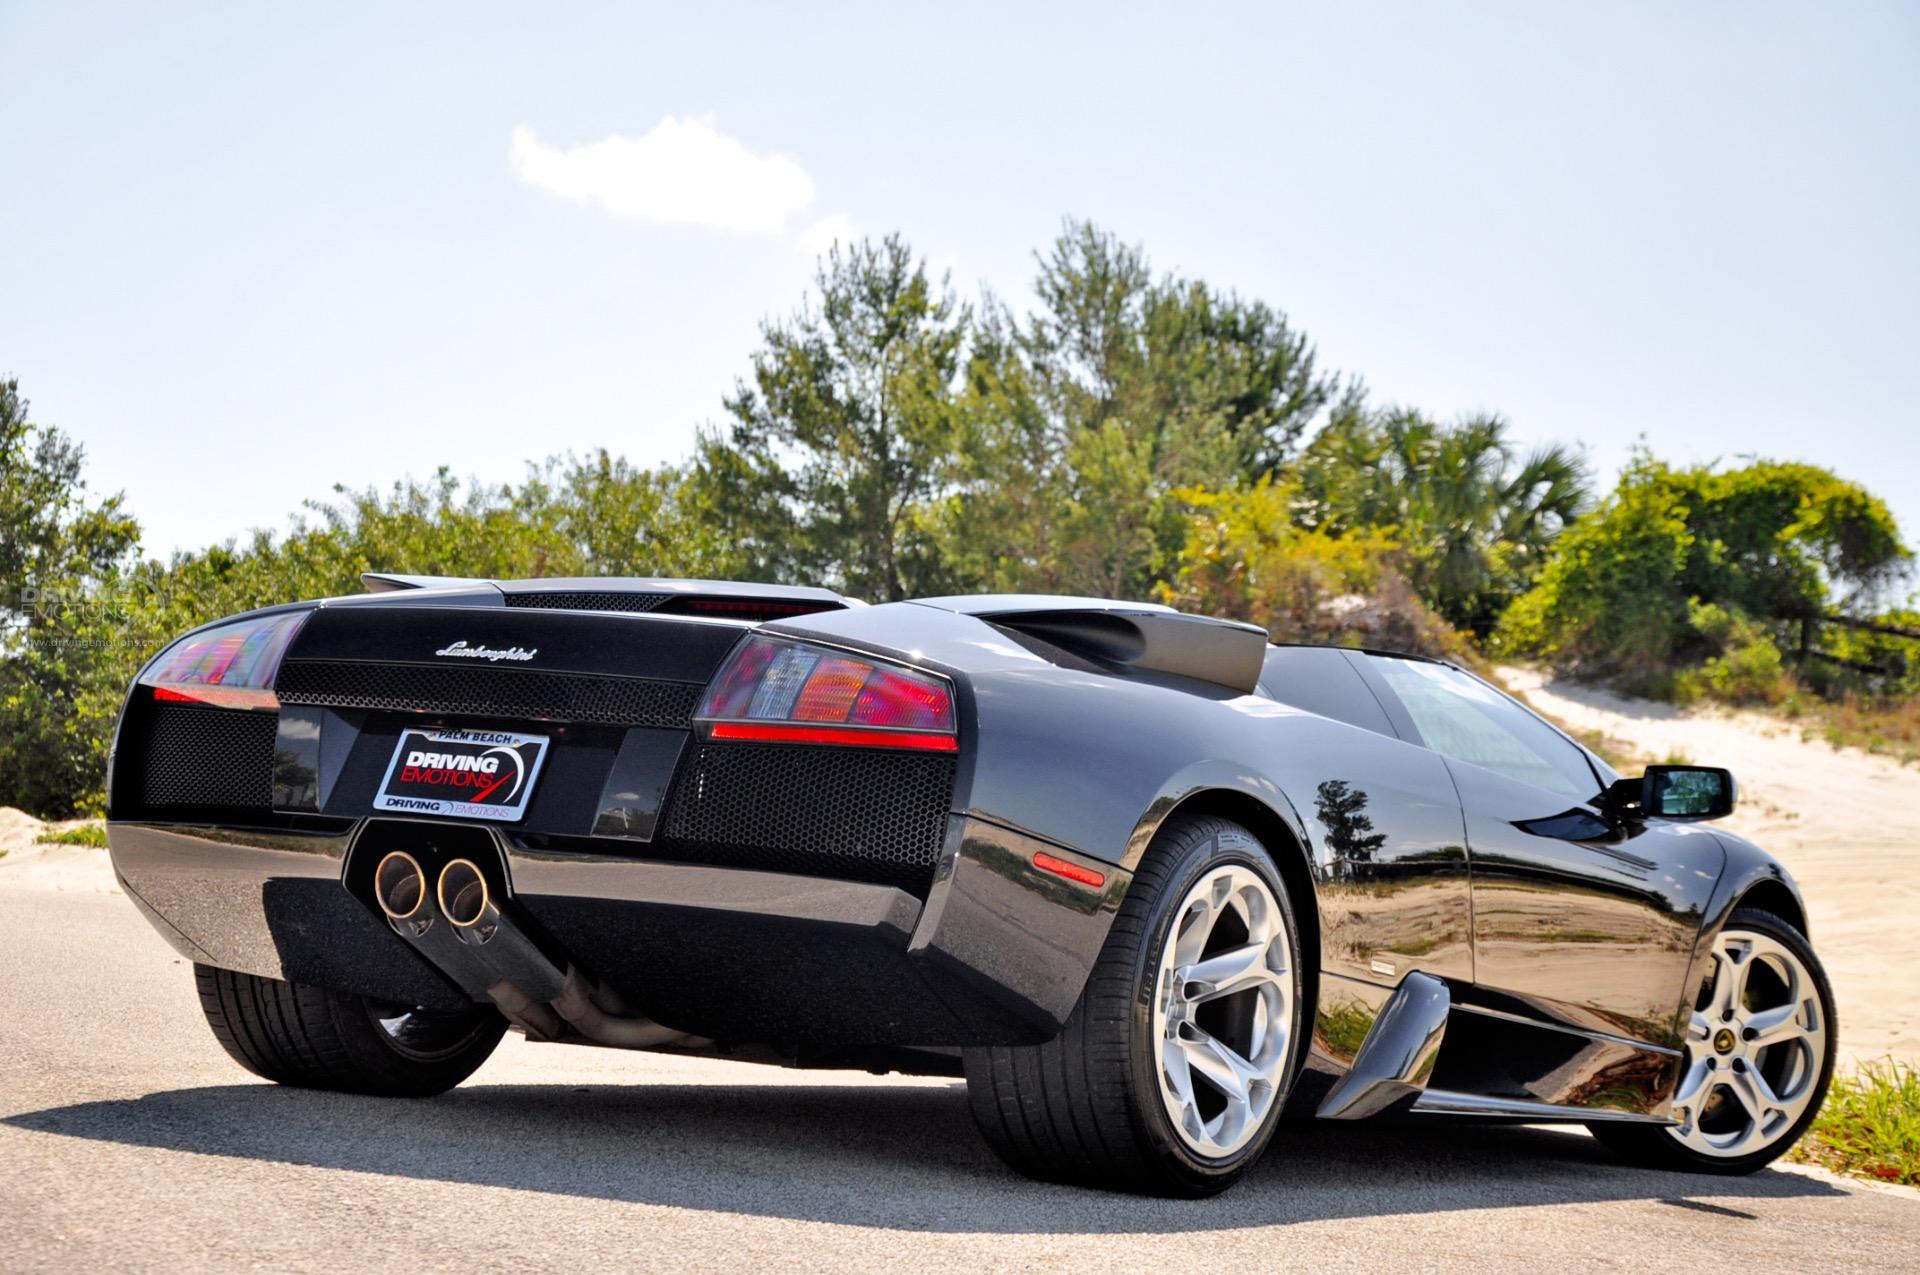 2005 Lamborghini Murcielago Roadster Roadster Stock 5868